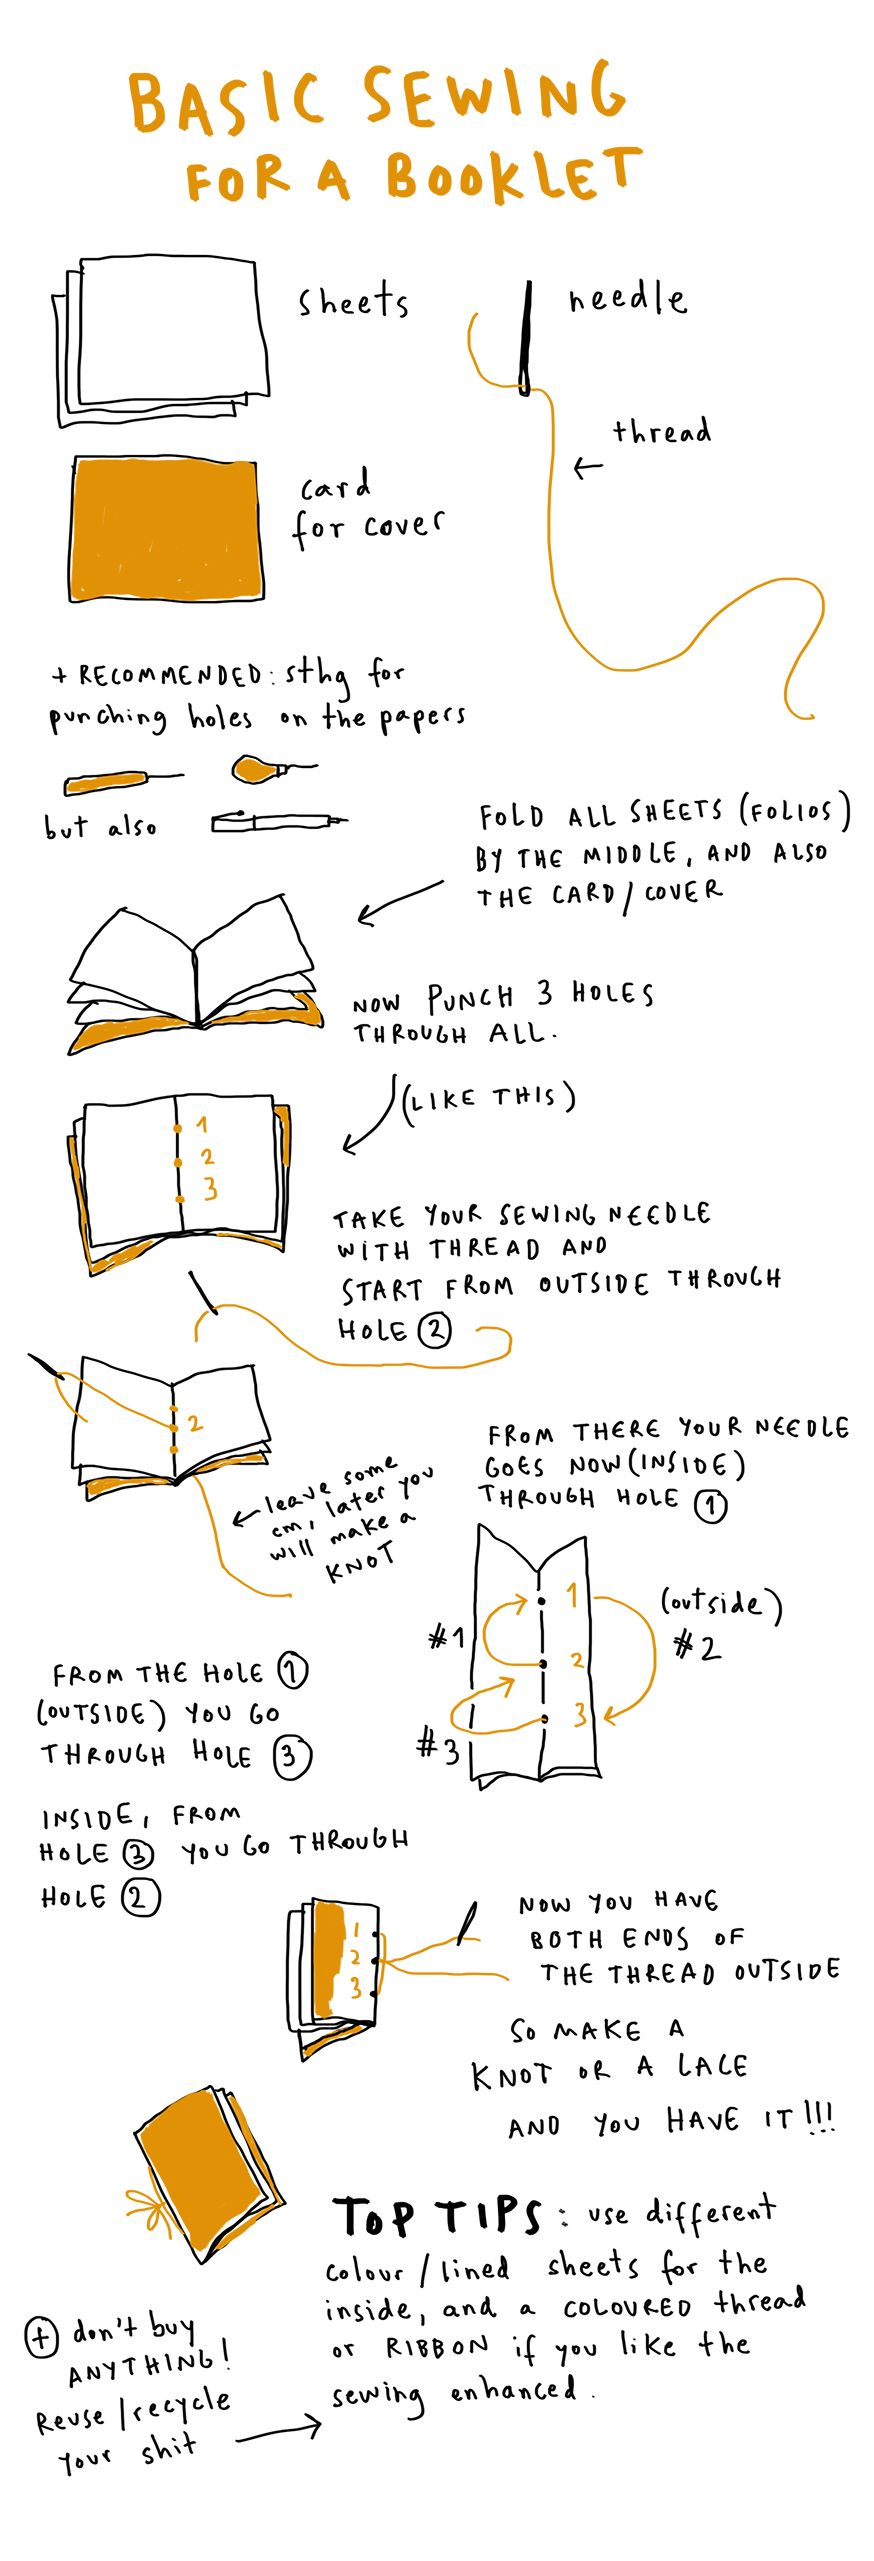 Wordpress Com Bookbinding Diy Book Sewing Basics